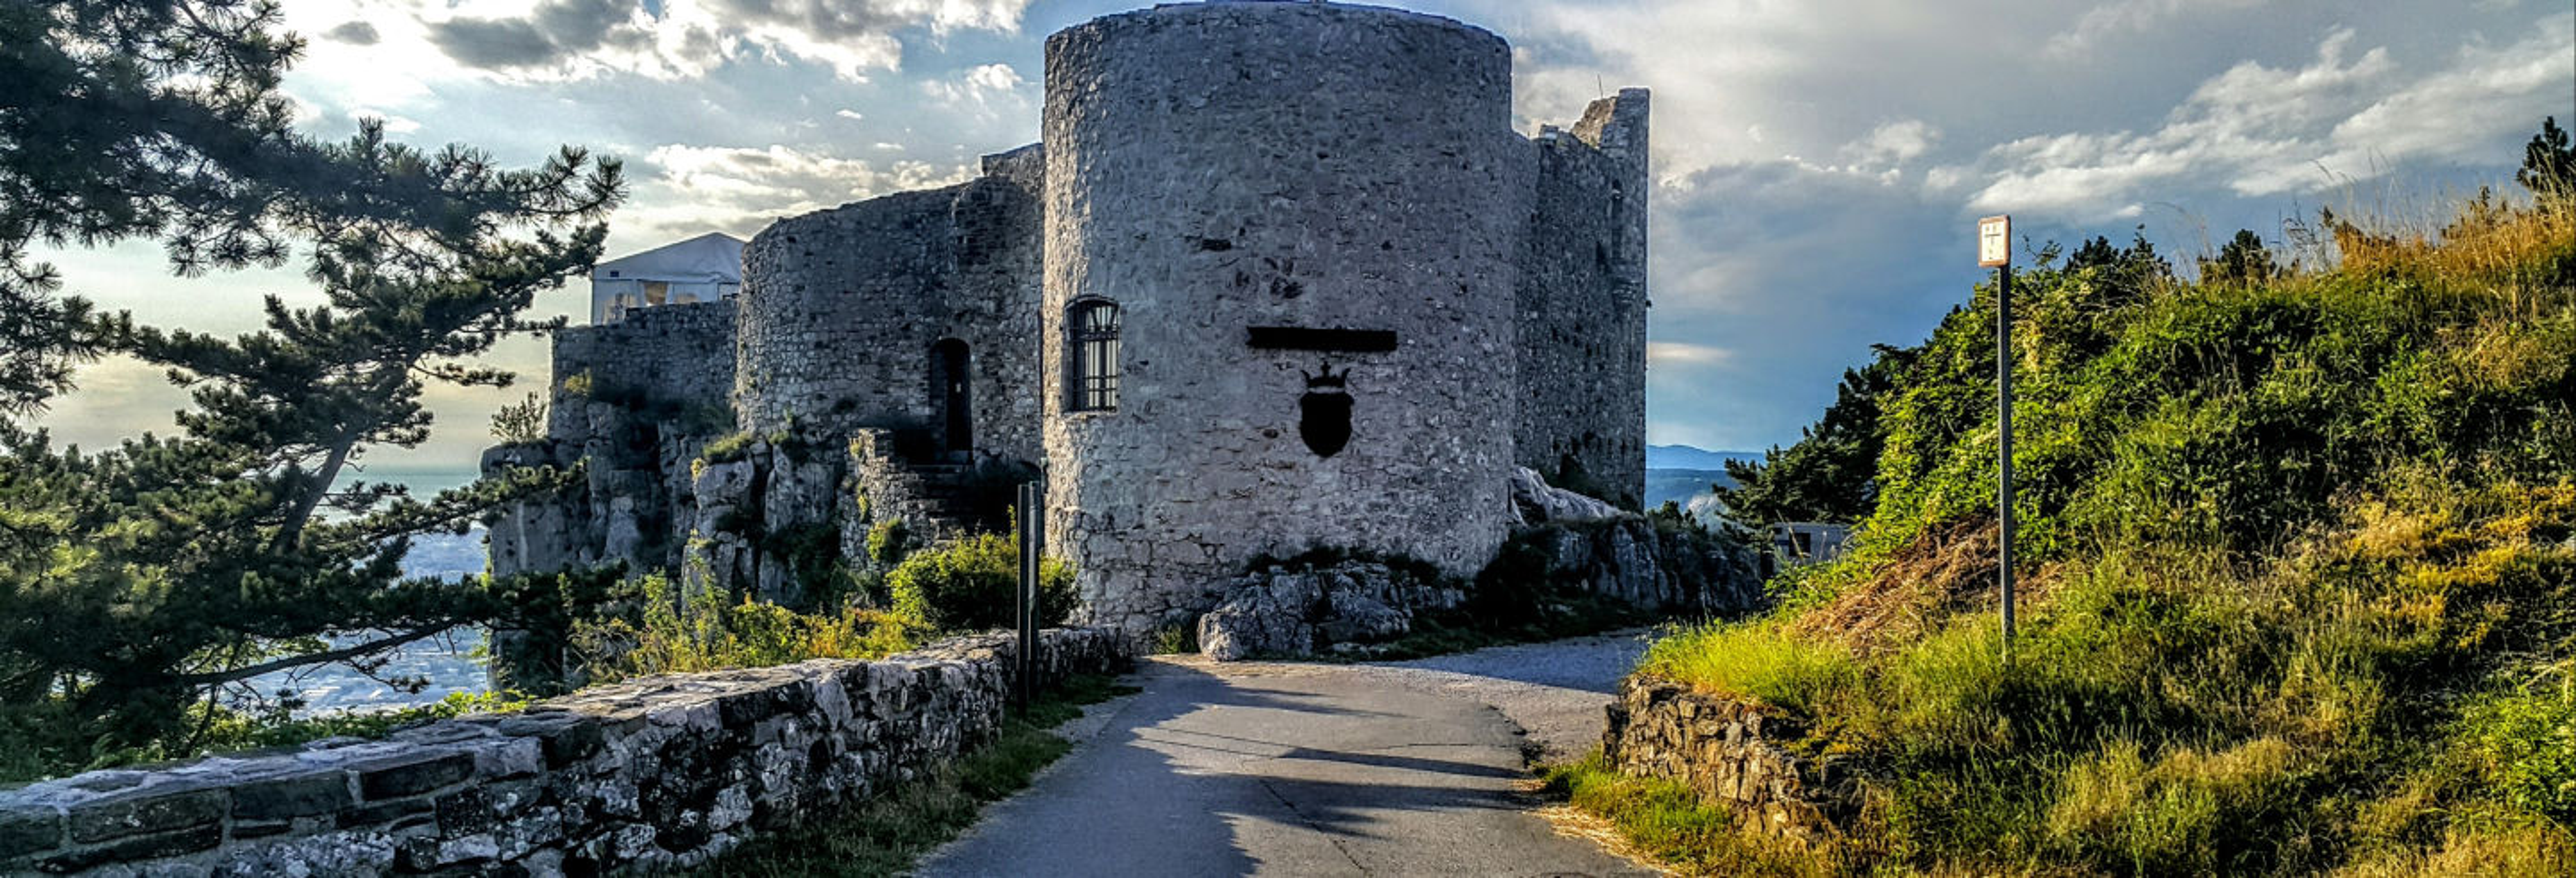 Excursão a Socerb, Hrastovlje e Marezige